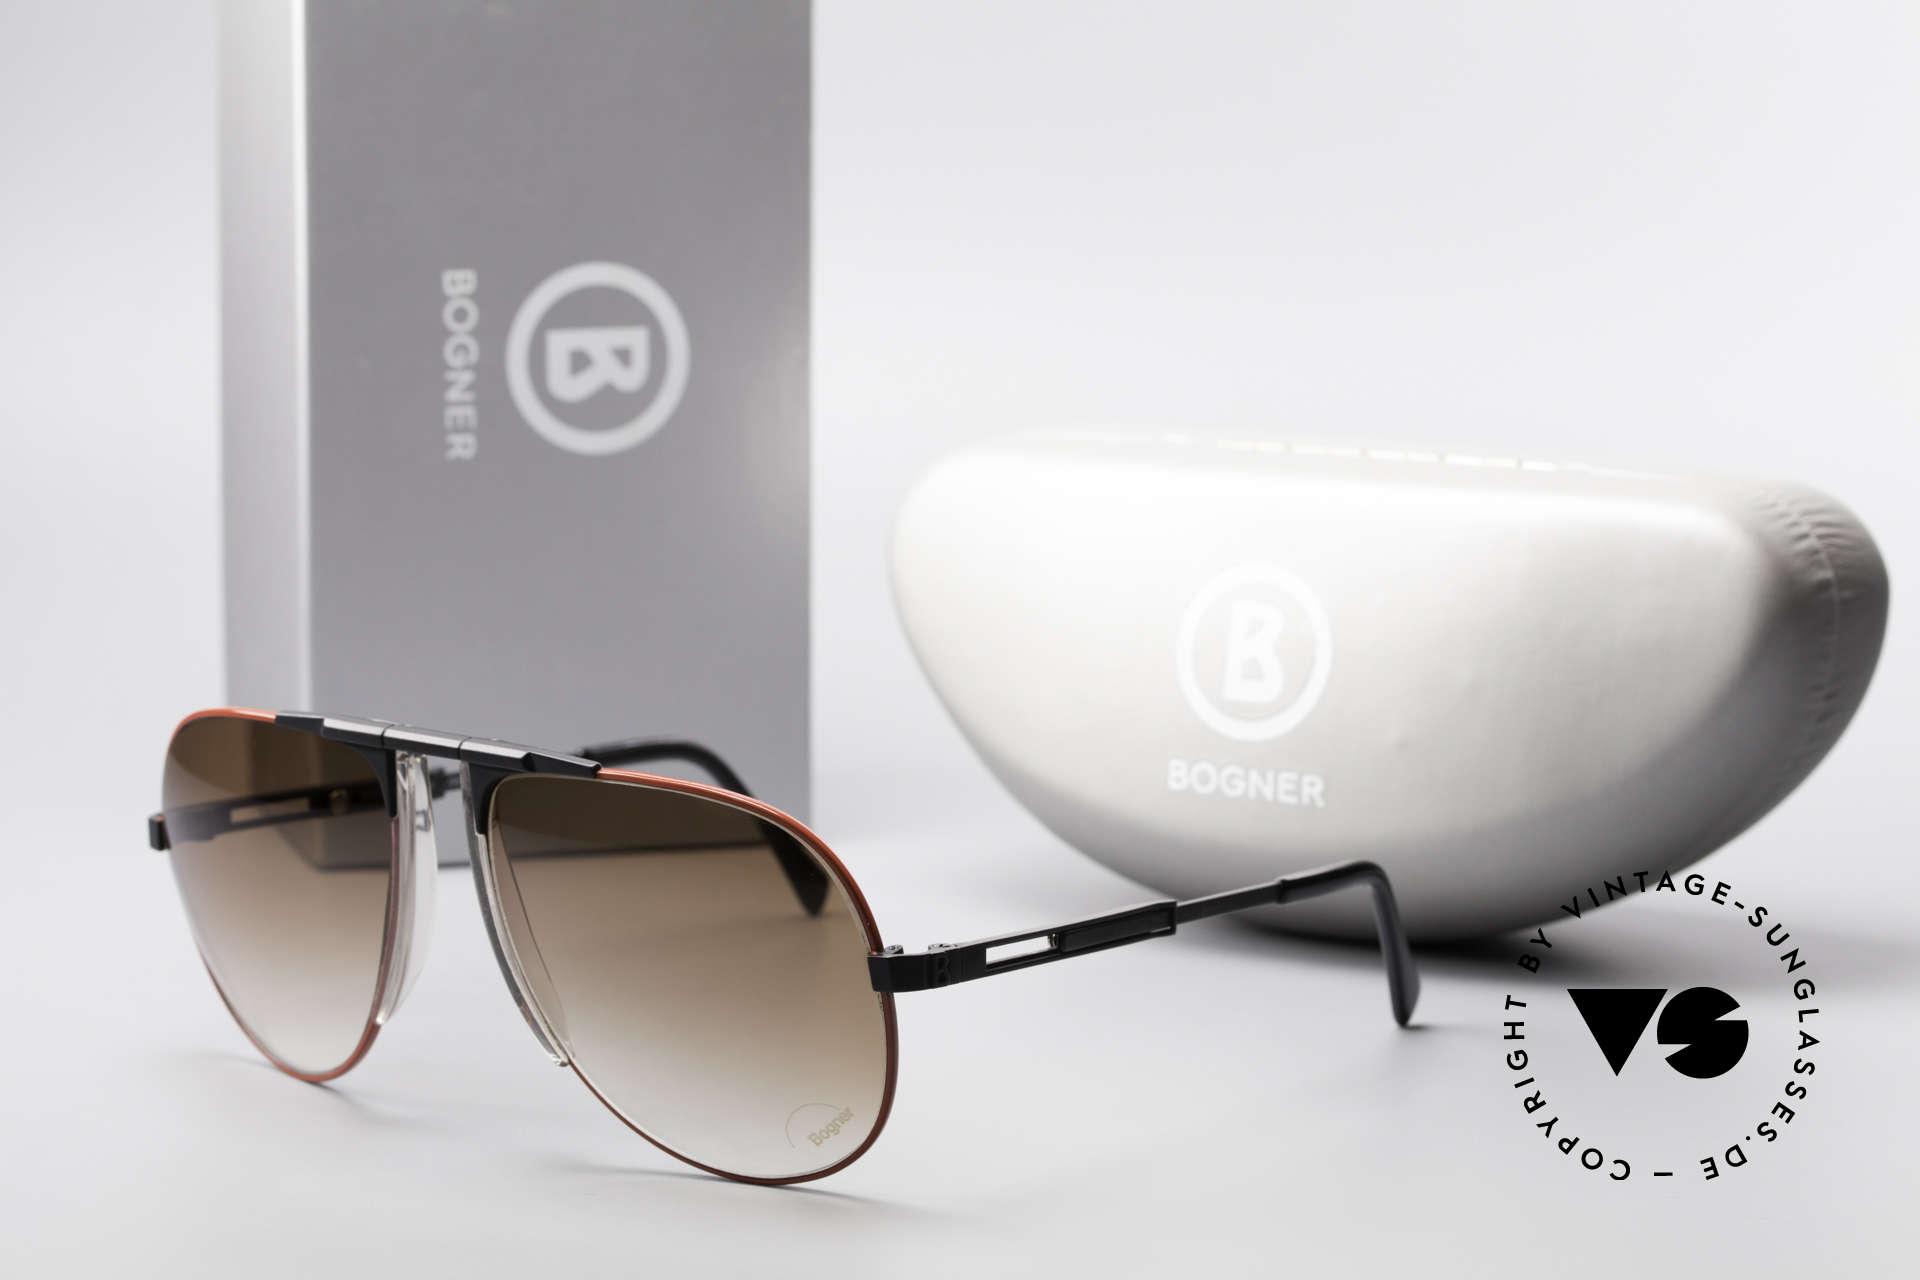 Willy Bogner 7011 Adjustable 80's Sunglasses, Size: large, Made for Men